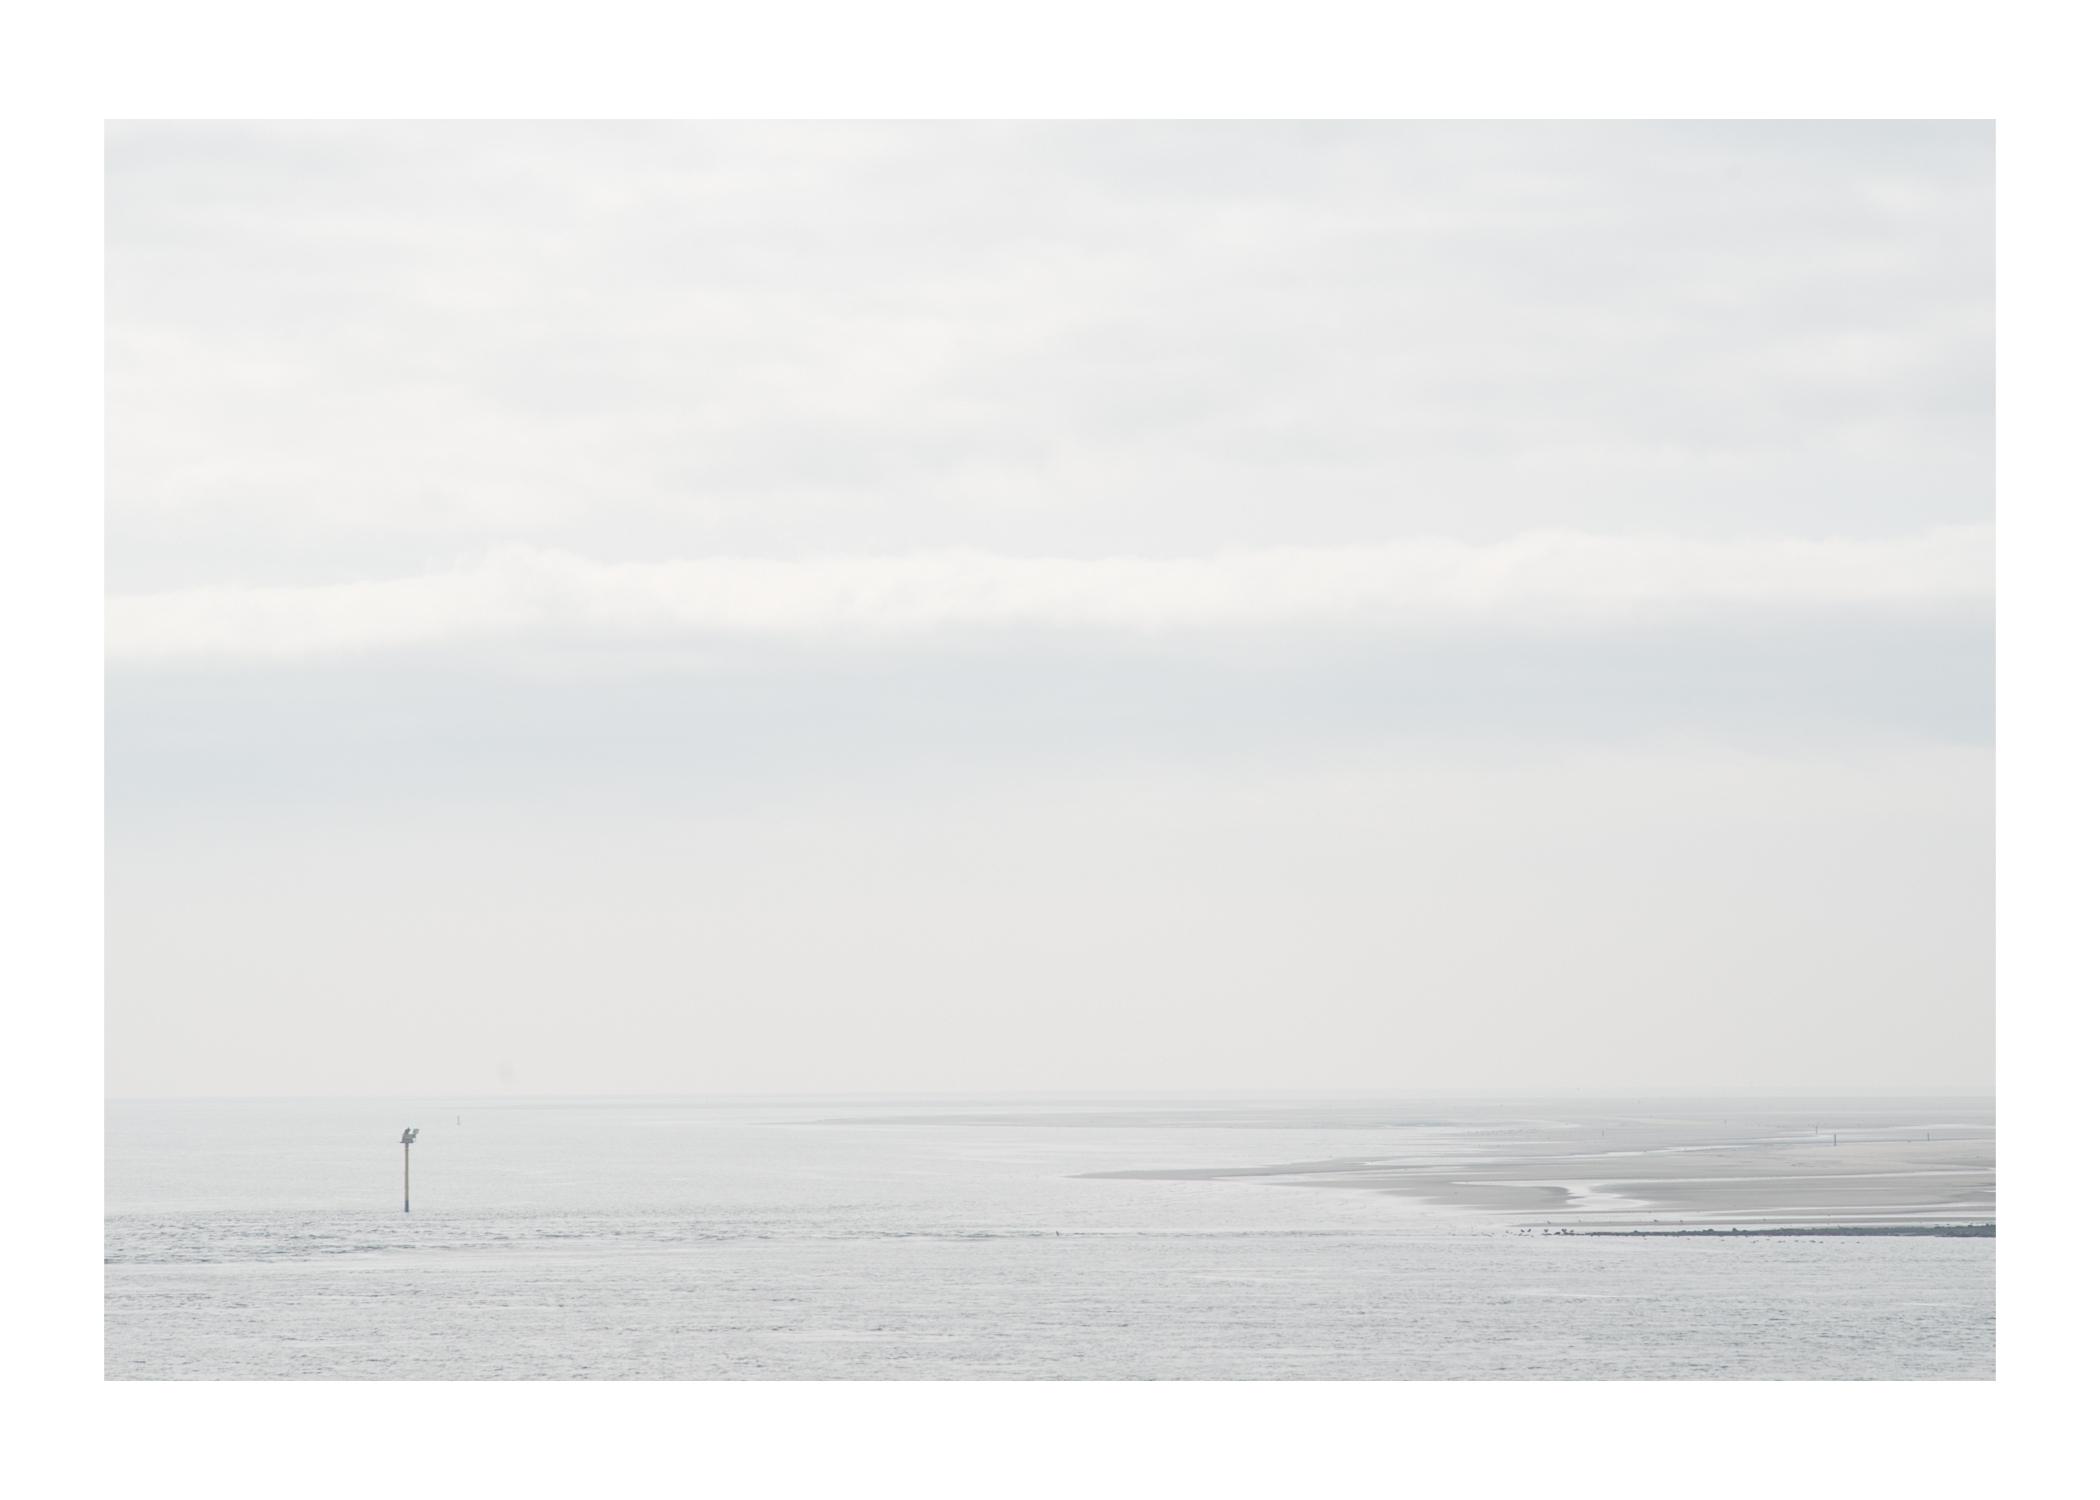 2016-Texel-kustlijn